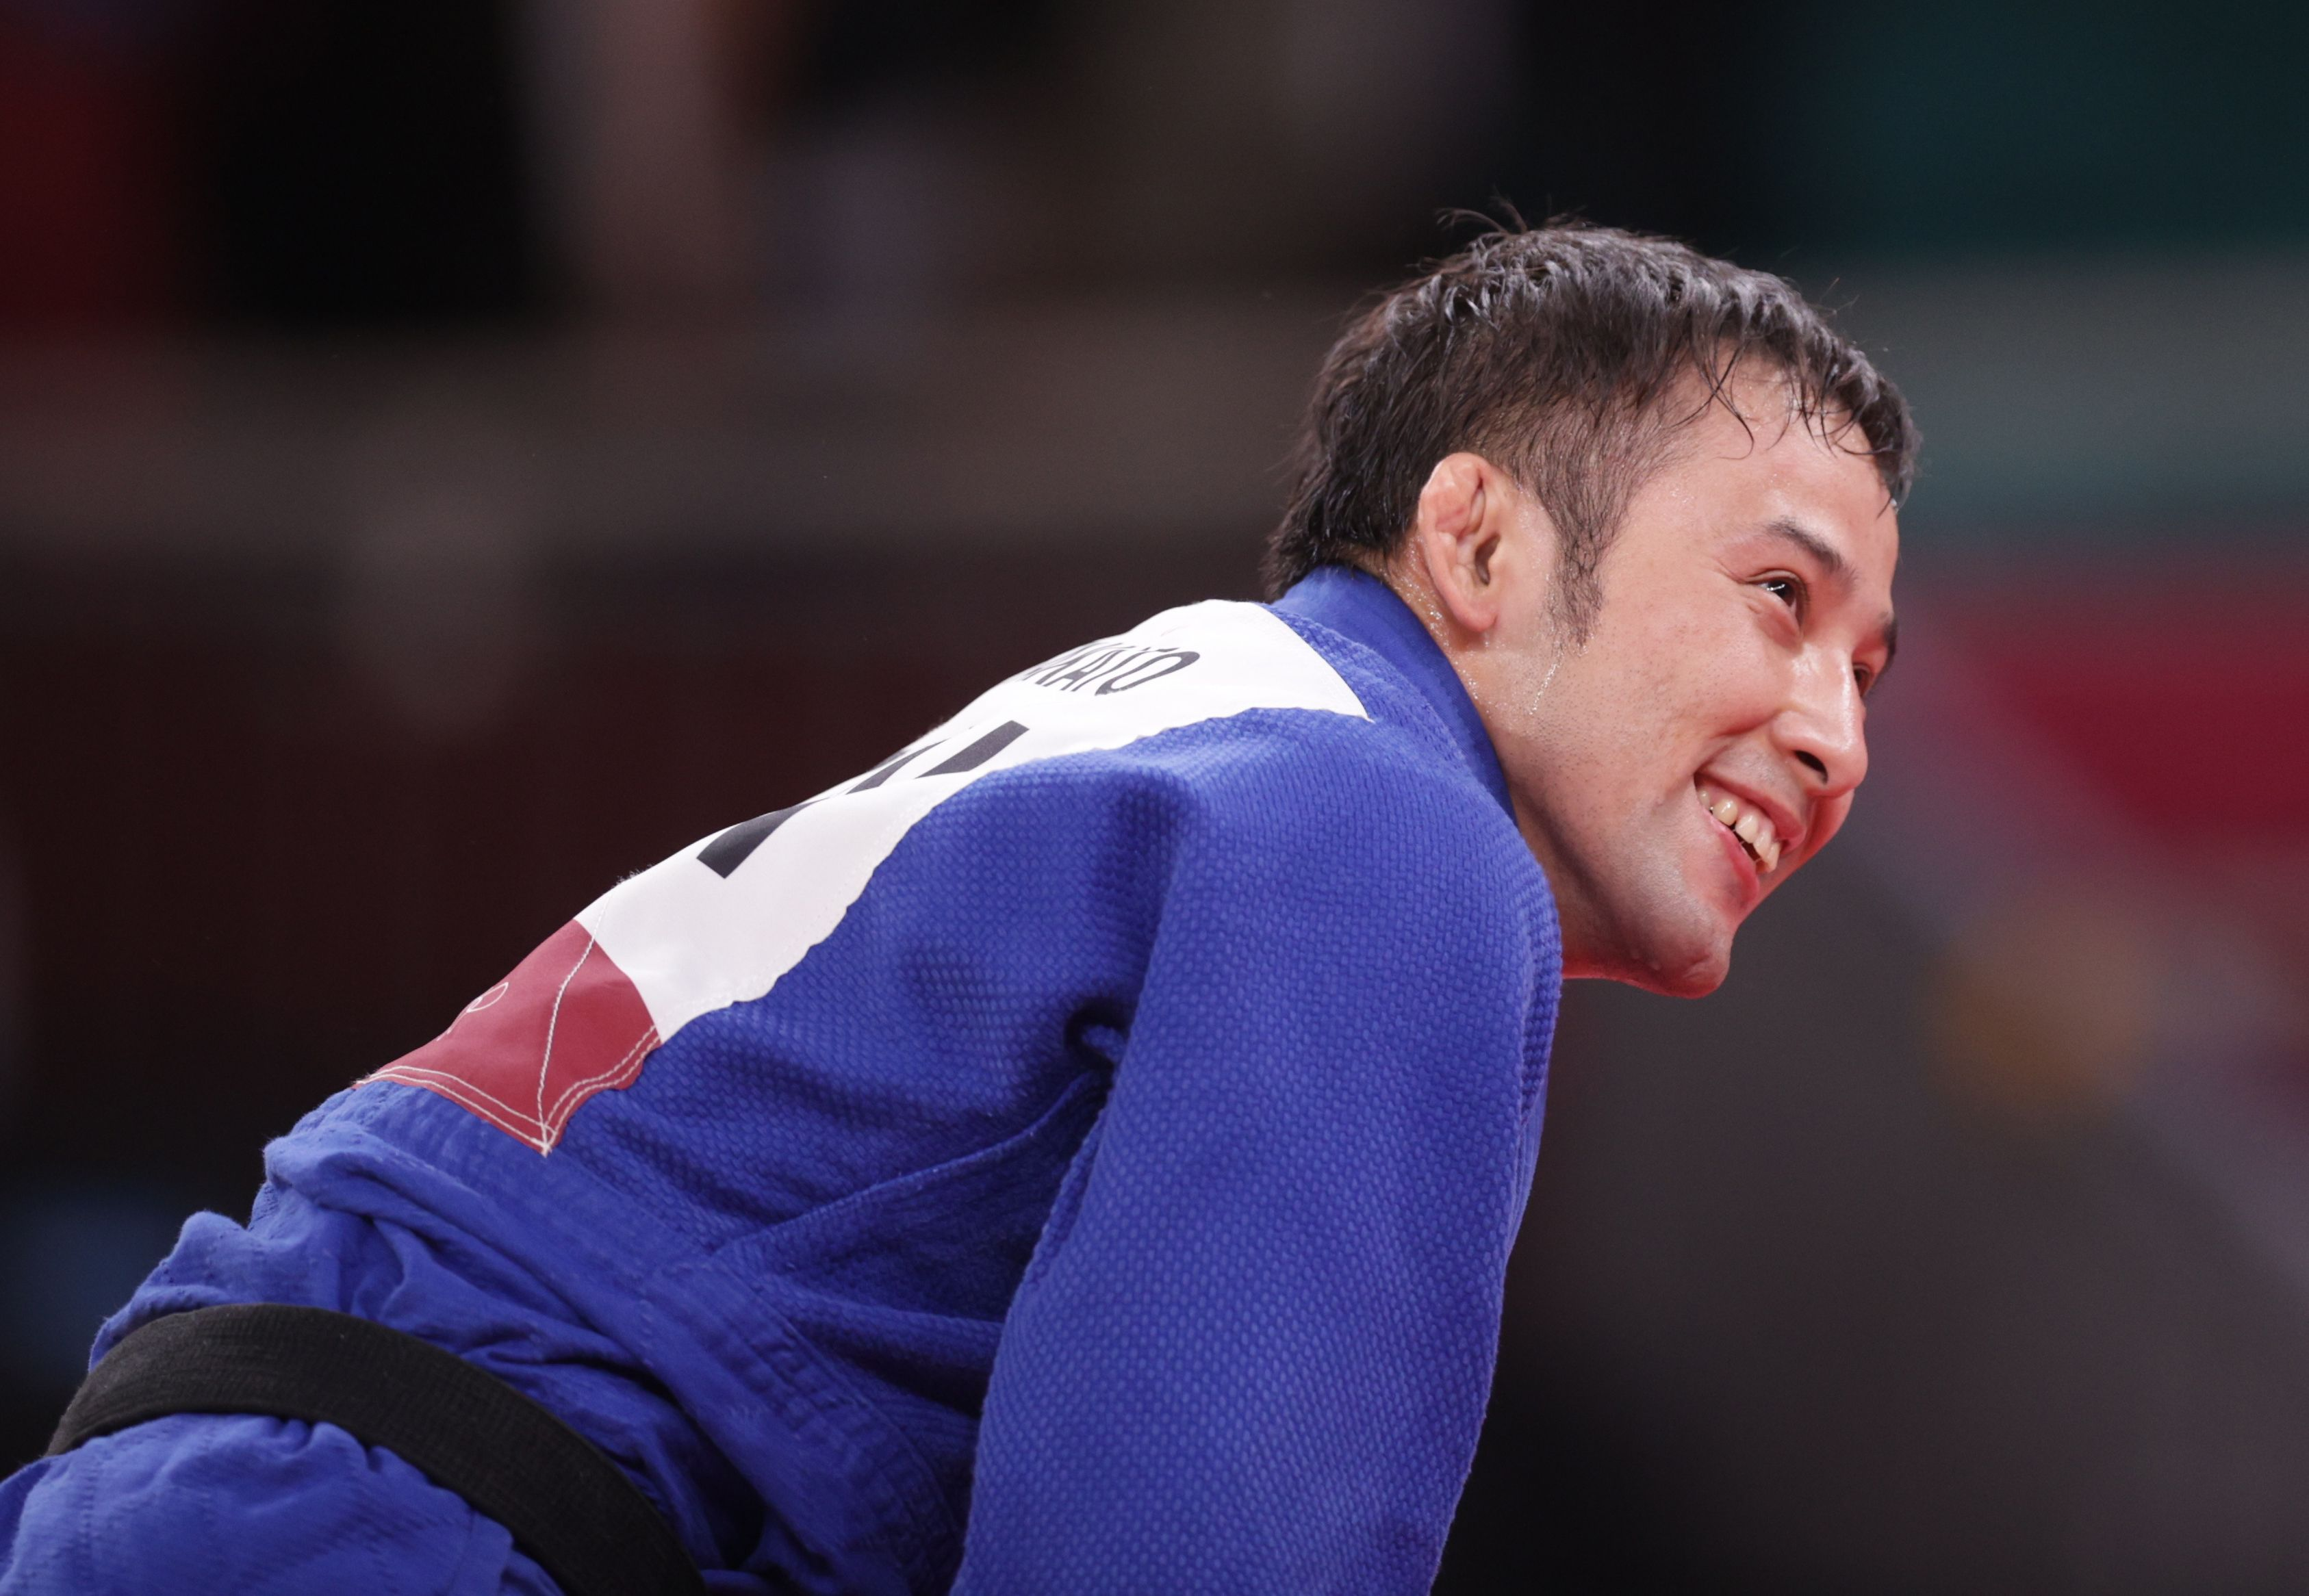 Tokyo 2020 Olympics - Judo - Men's 60kg - Gold medal match - Nippon Budokan - Tokyo, Japan - July 24, 2021. Naohisa Takato of Japan reacts after winning gold REUTERS/Hannah Mckay